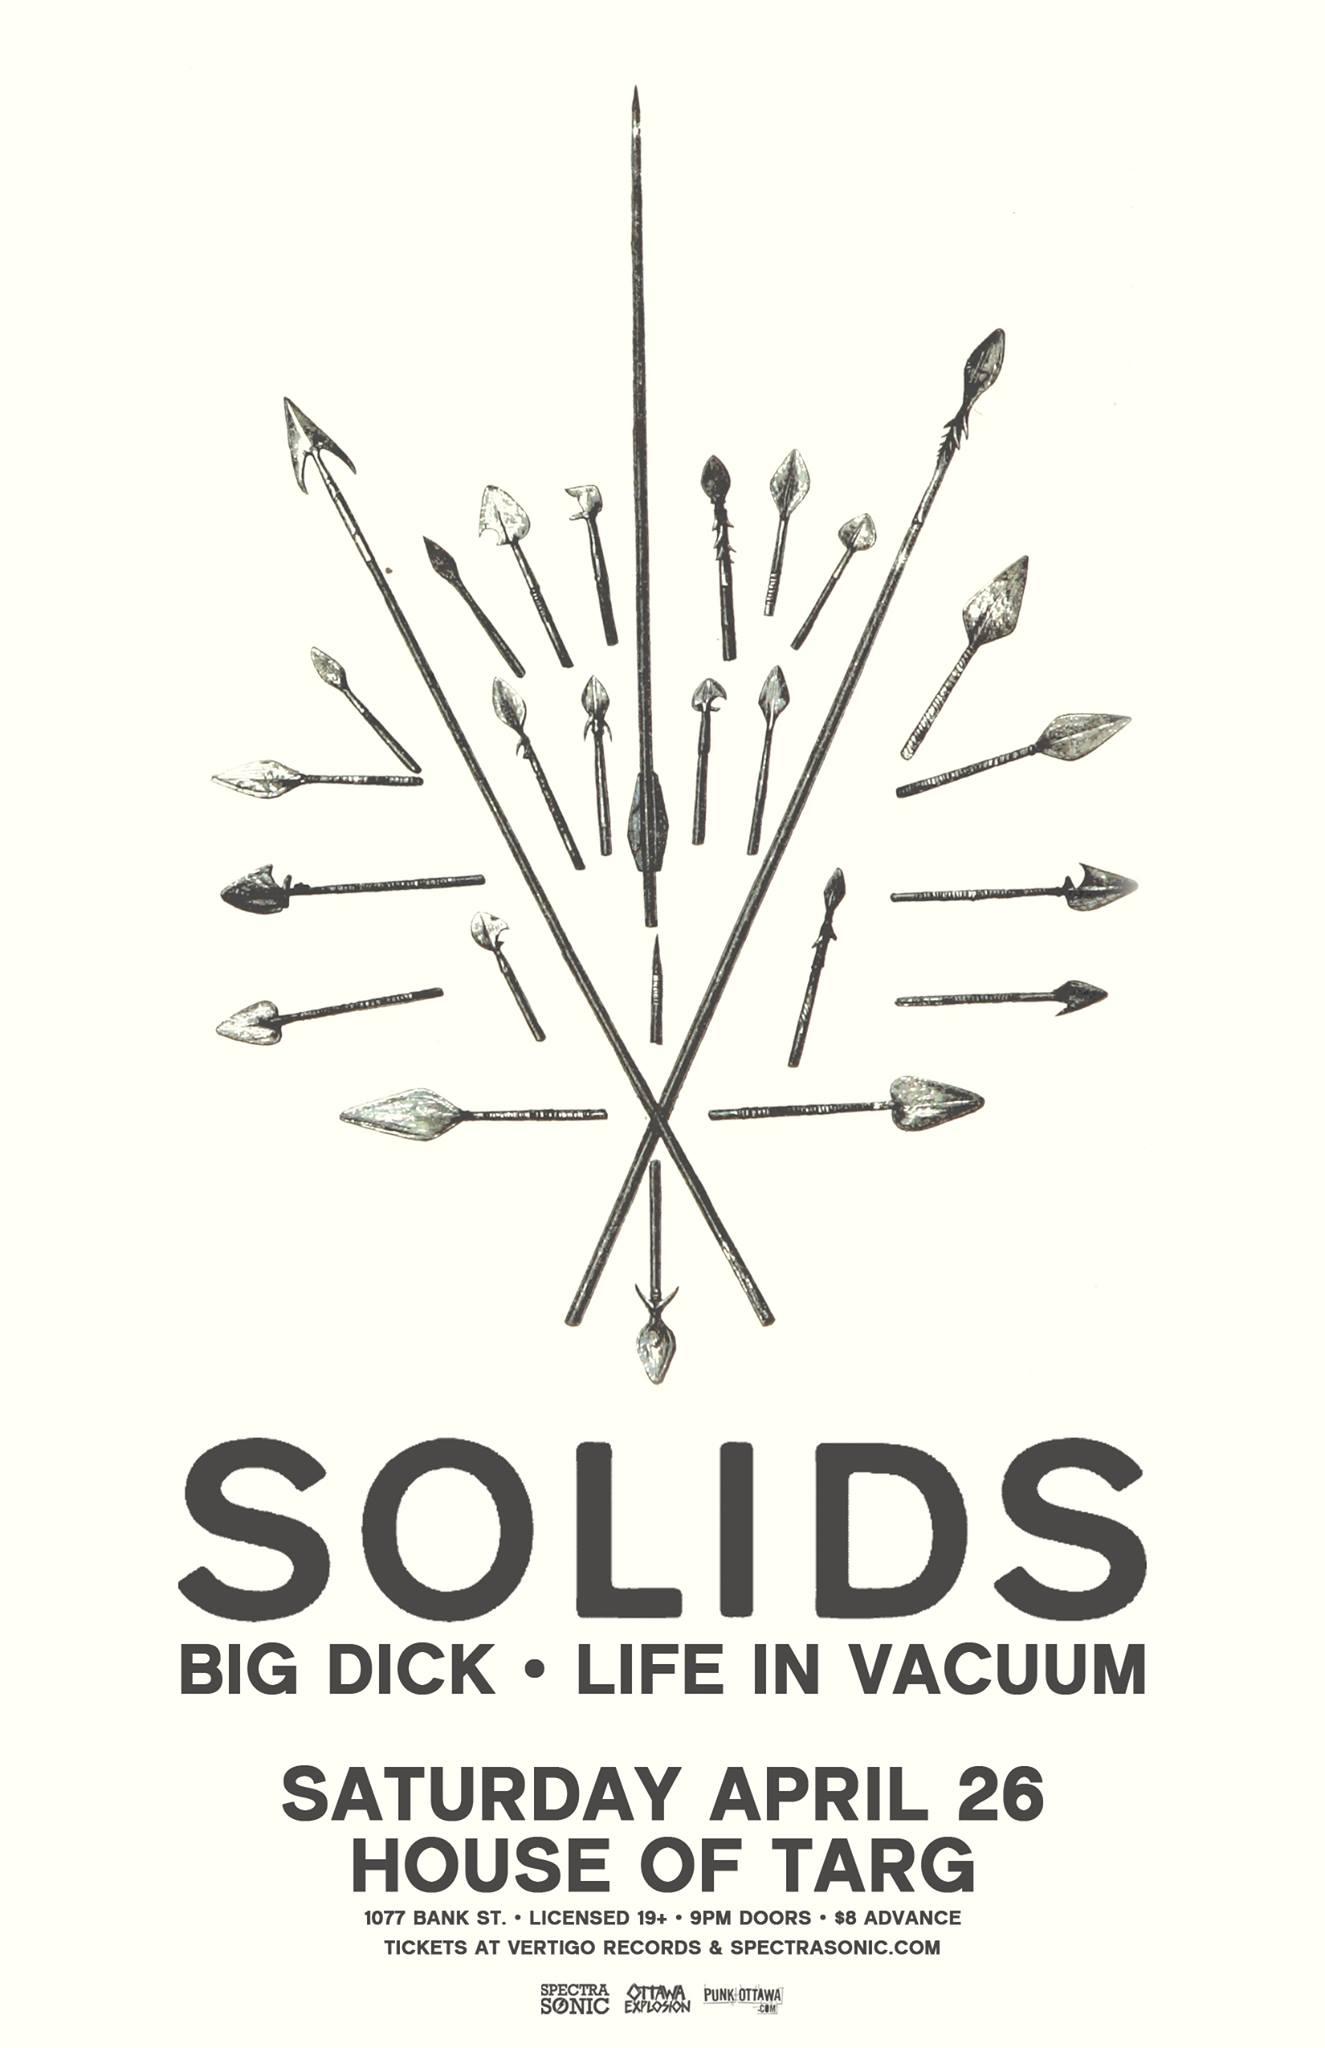 Advertizing a big dick